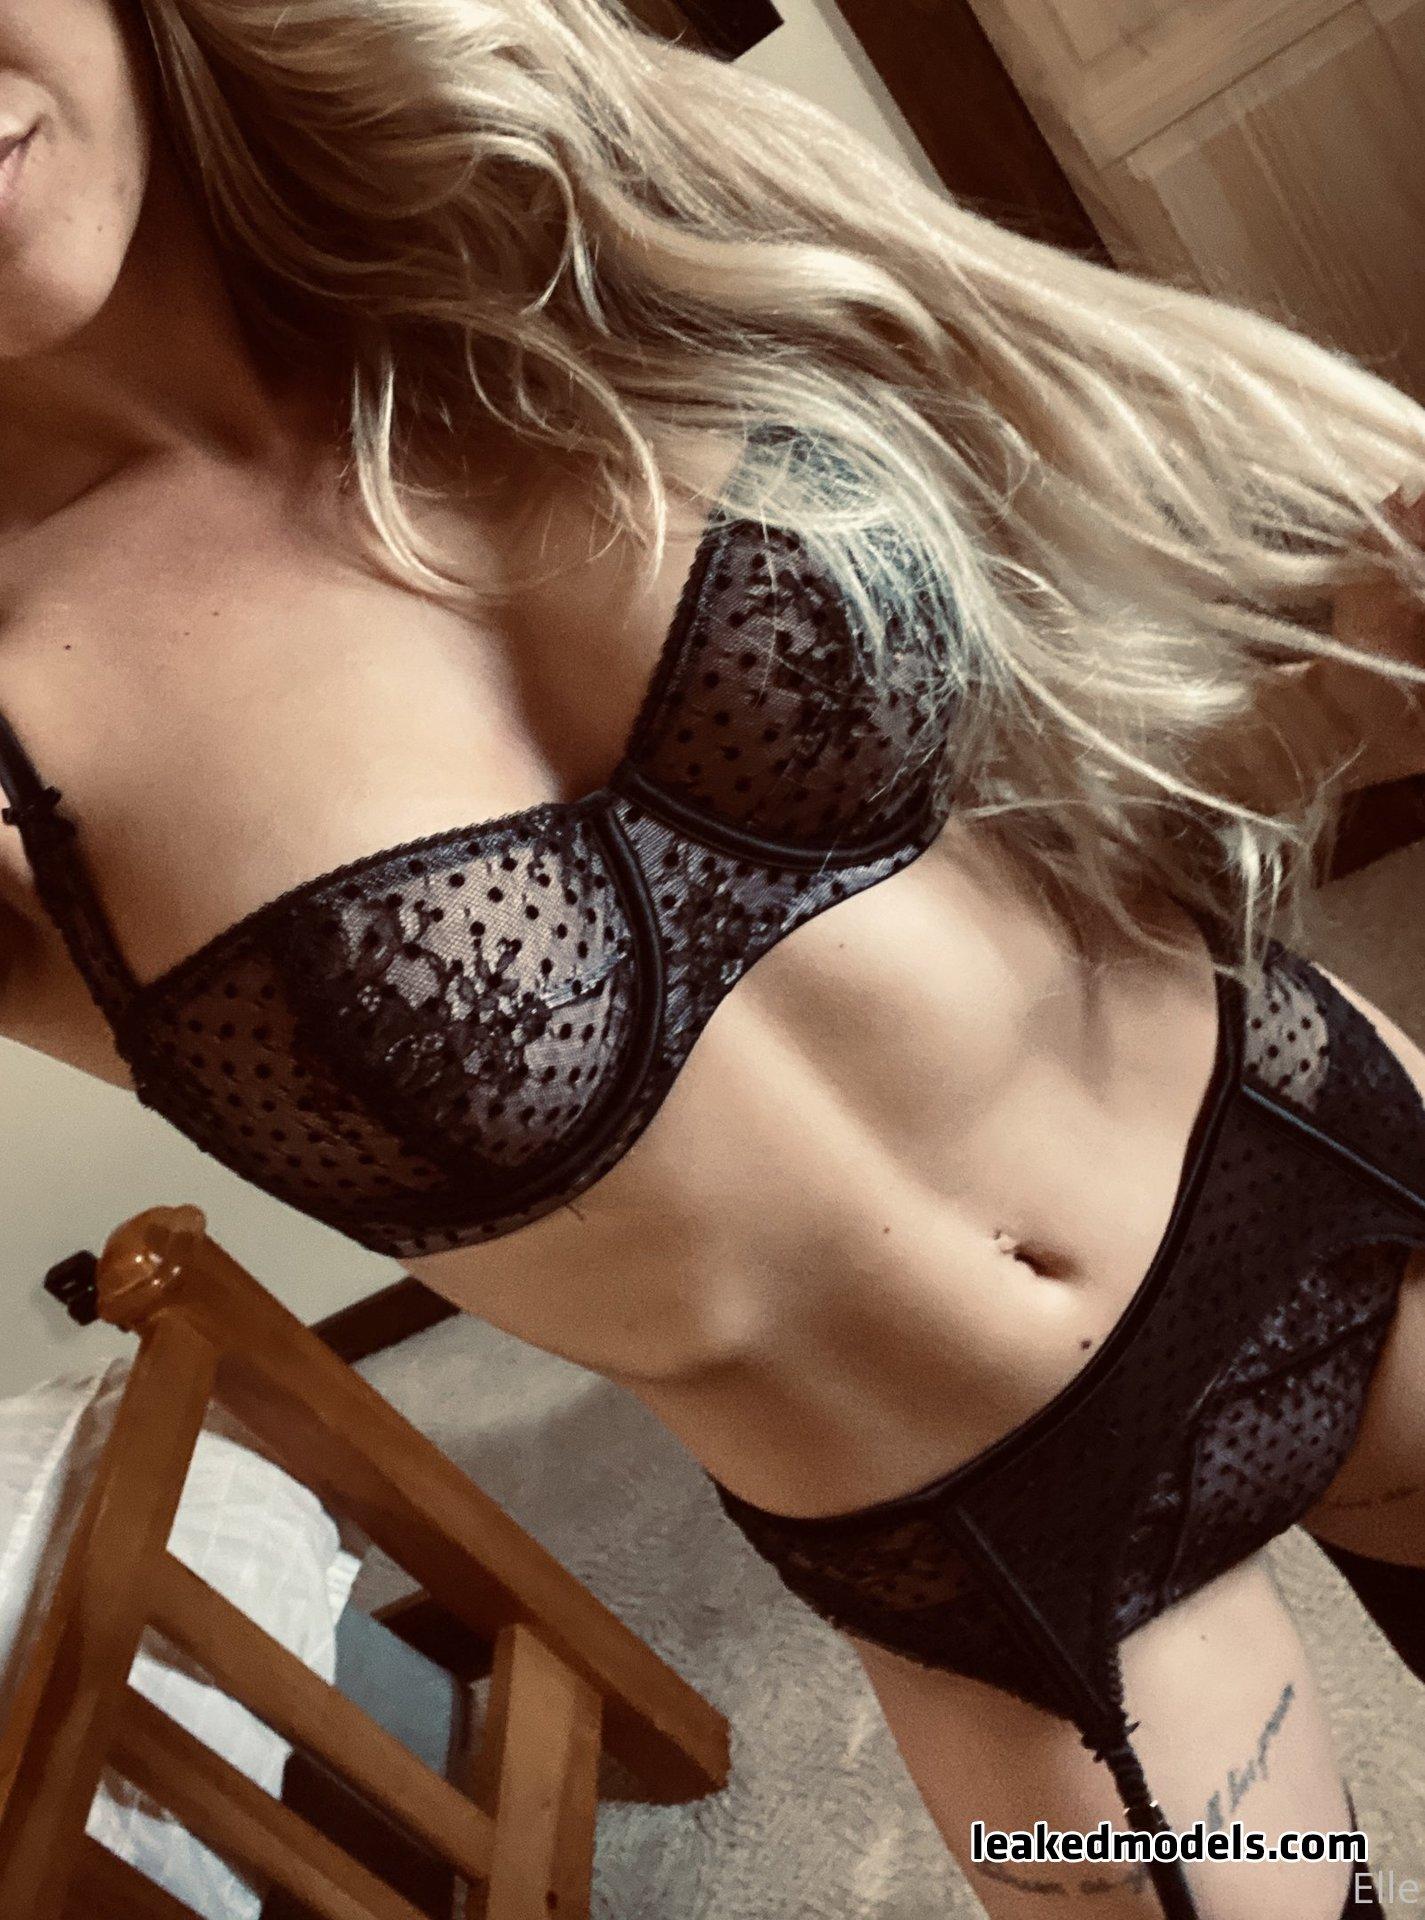 ellebelle1 leaked nude leakedmodels.com 0018 - Elle – ellebelle1 OnlyFans Nude Leaks (40 Photos)